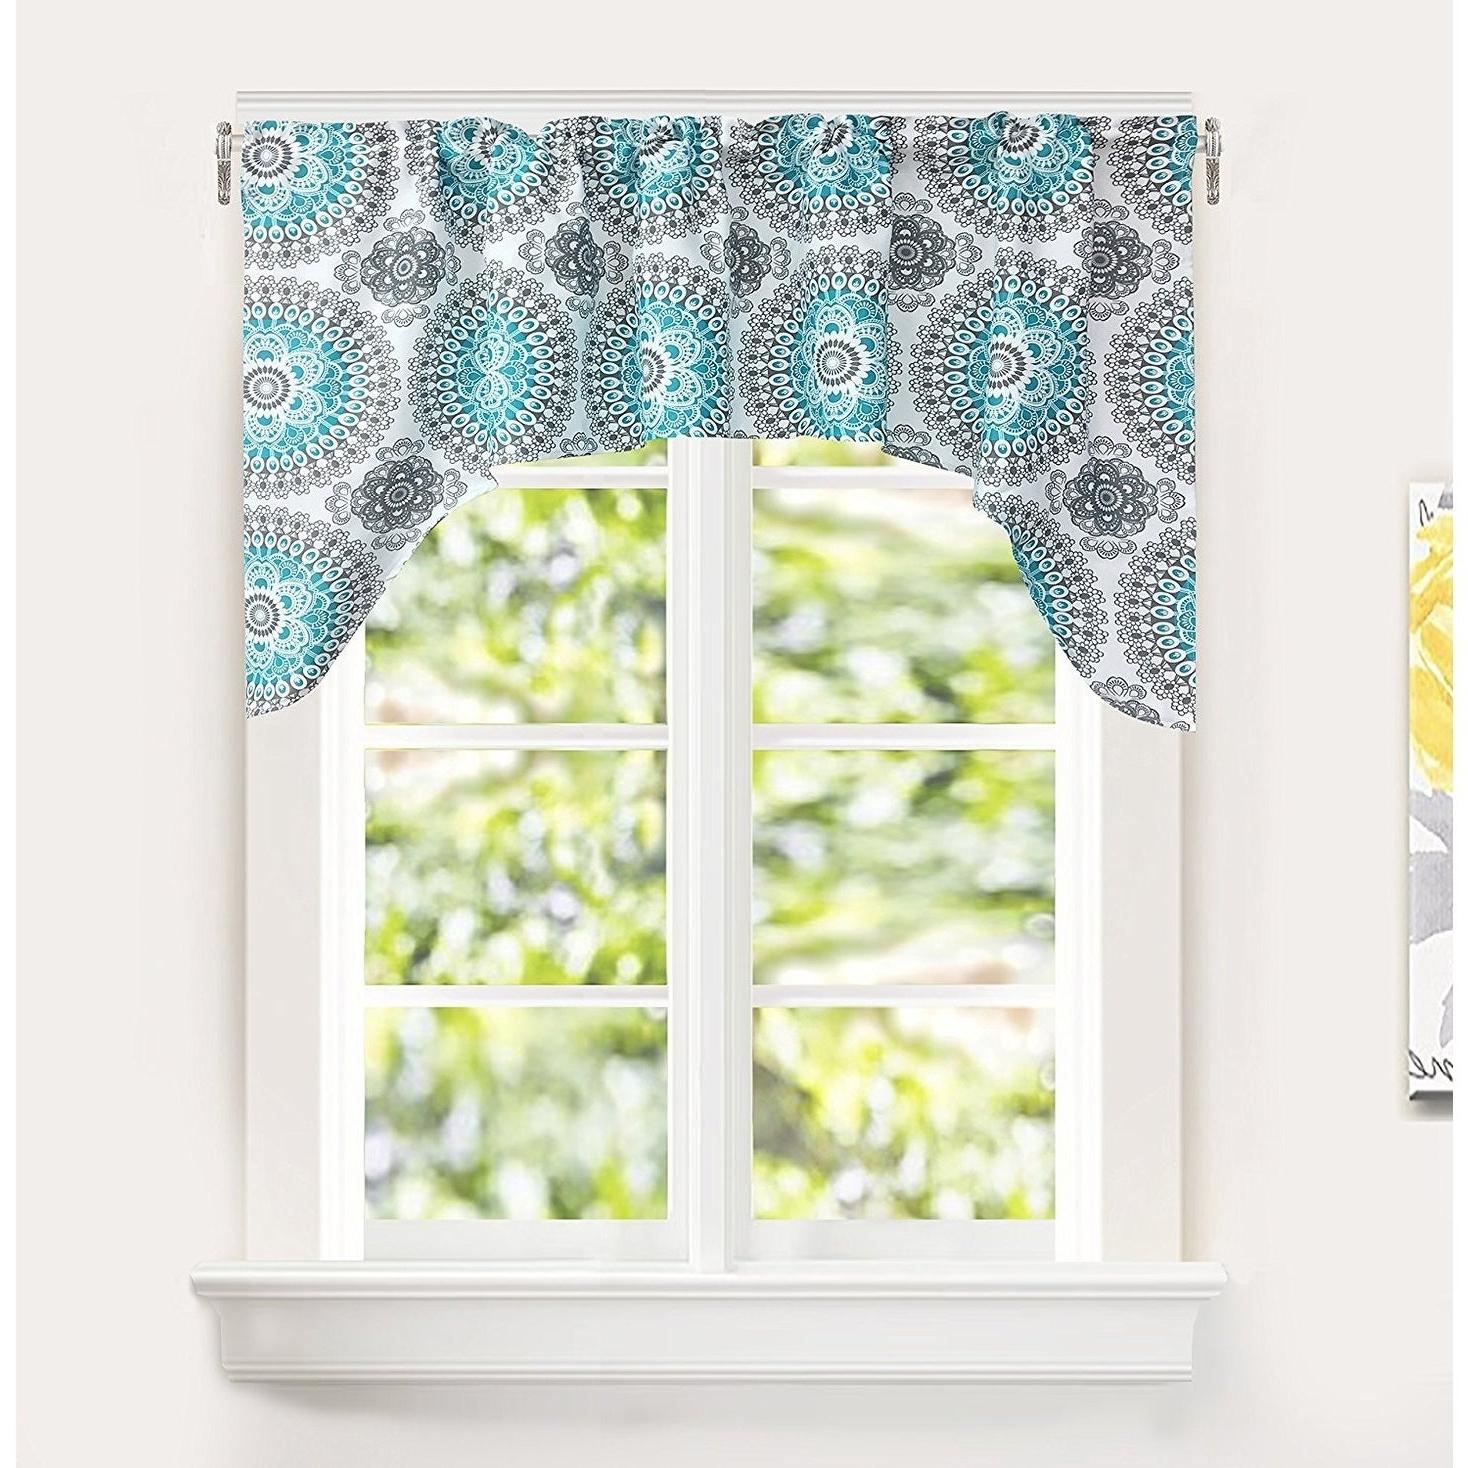 Most Current Medallion Window Curtain Valances Inside Driftaway Bella Medallion Pattern Kitchen Swag Valance (View 10 of 20)